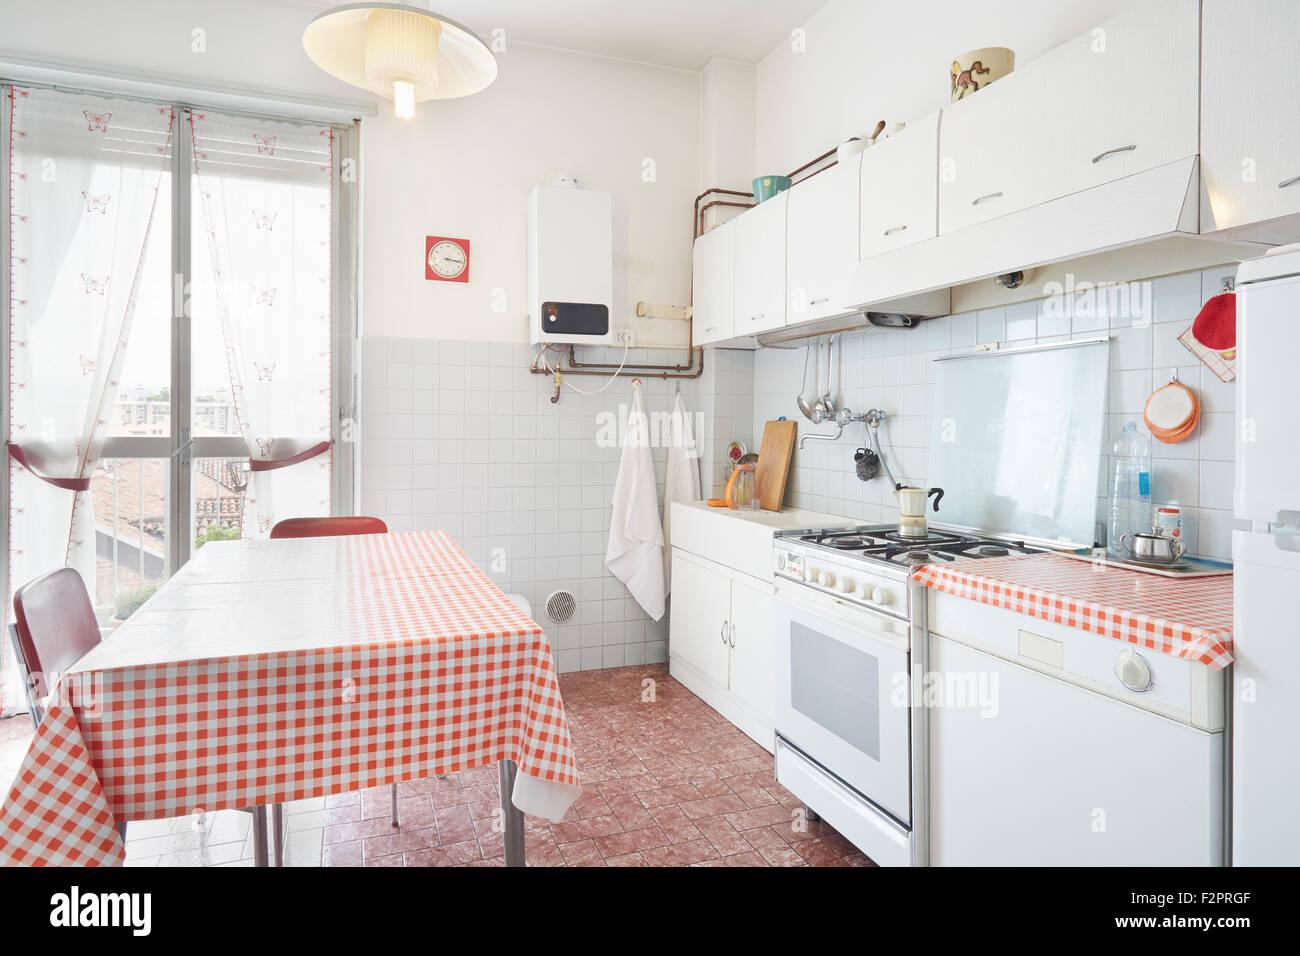 Boiler Room In Apartment Building Stock Photos & Boiler Room In ...